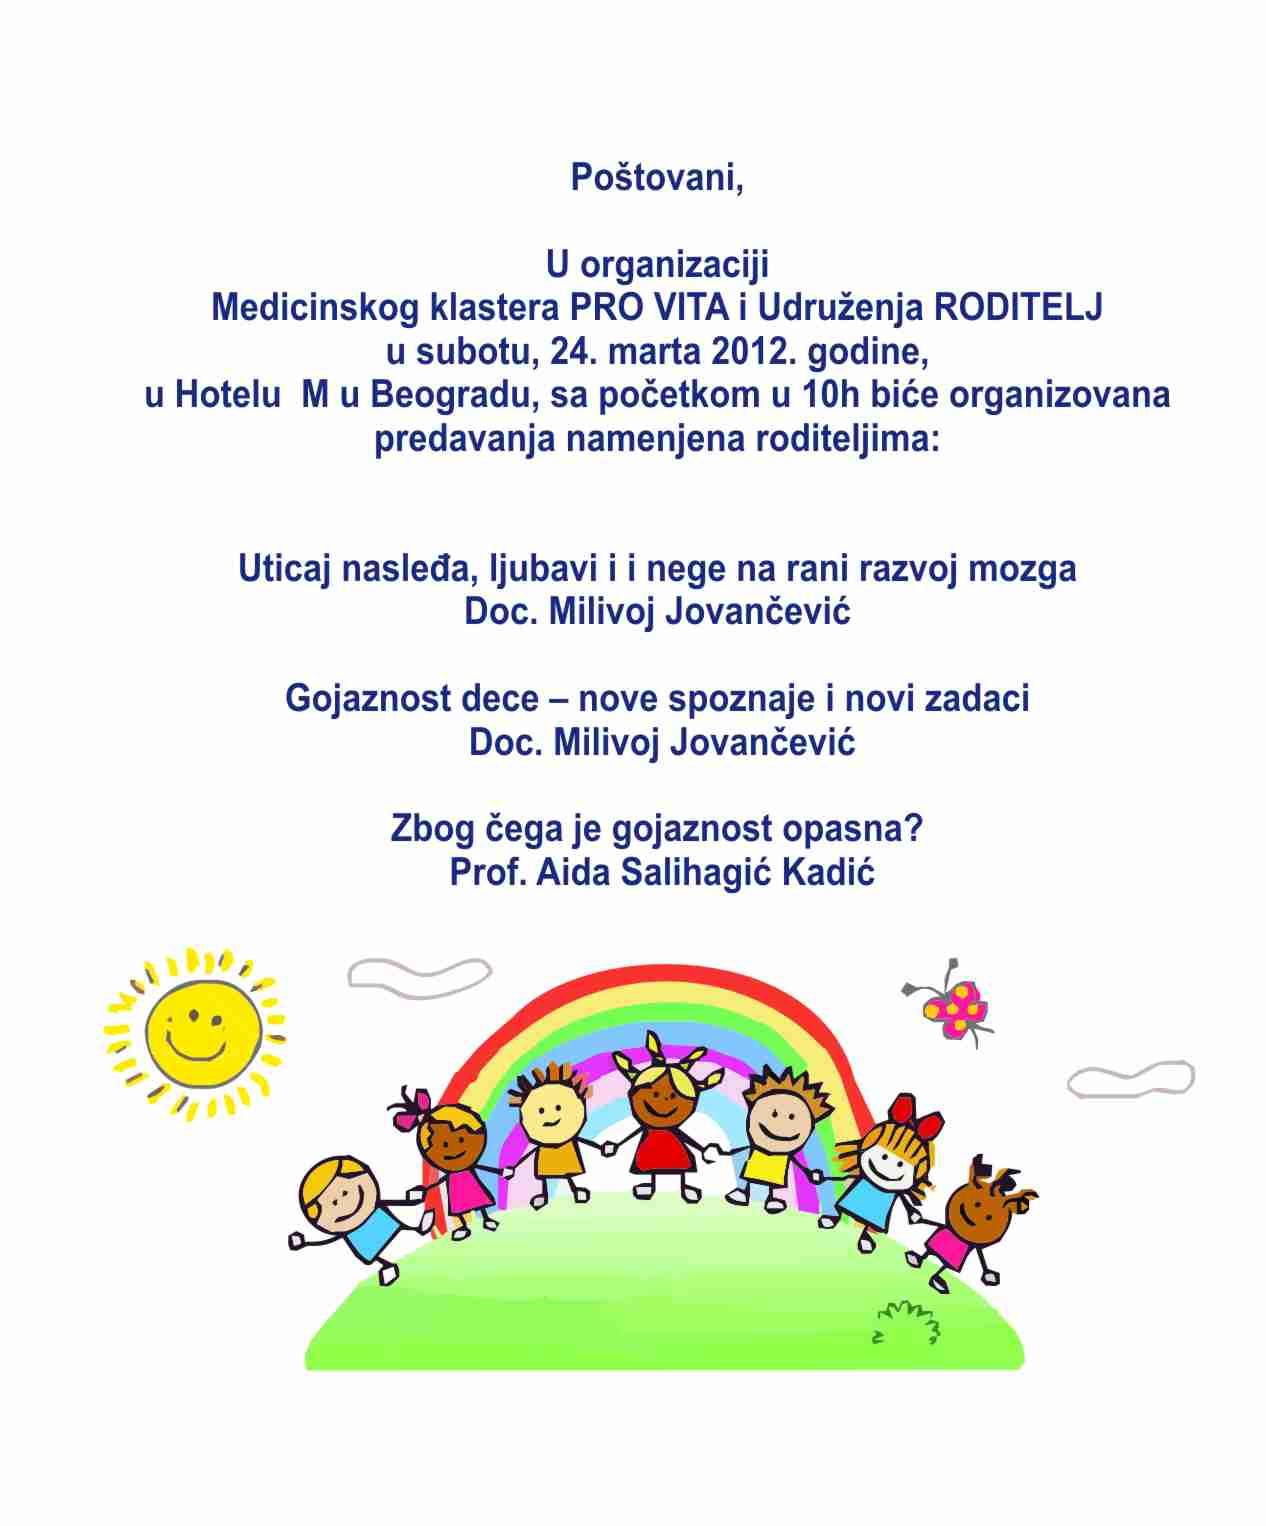 Udruzenje RODITELJ - predavanja za roditelje